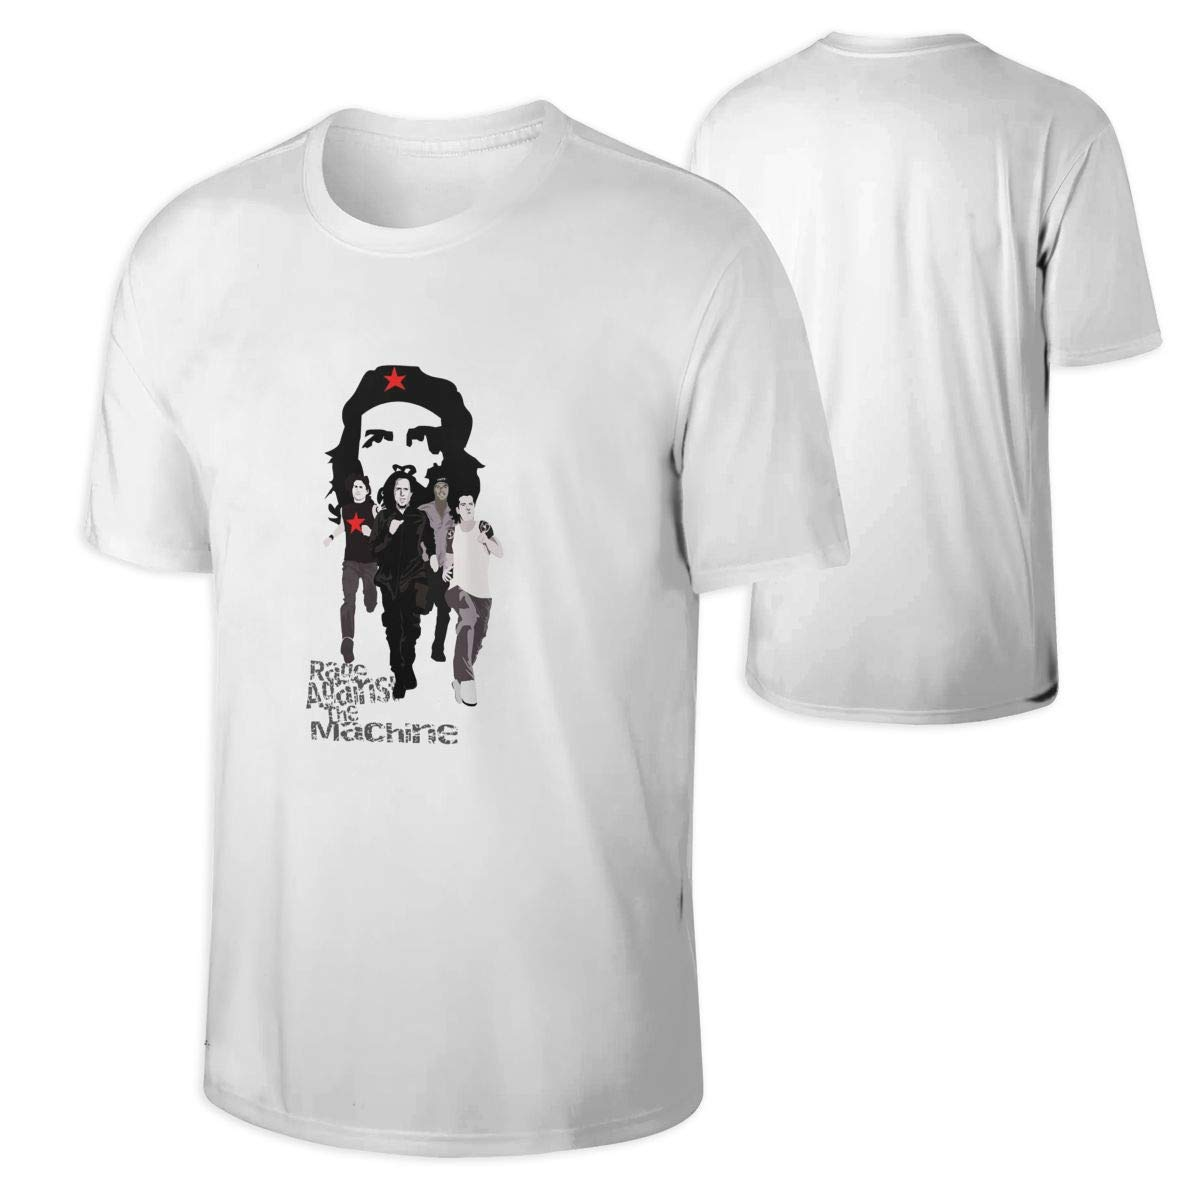 Huajianuk Rage Against The Machine Short Tshirt Printed Pullover Casual Round Neck Tees Ts